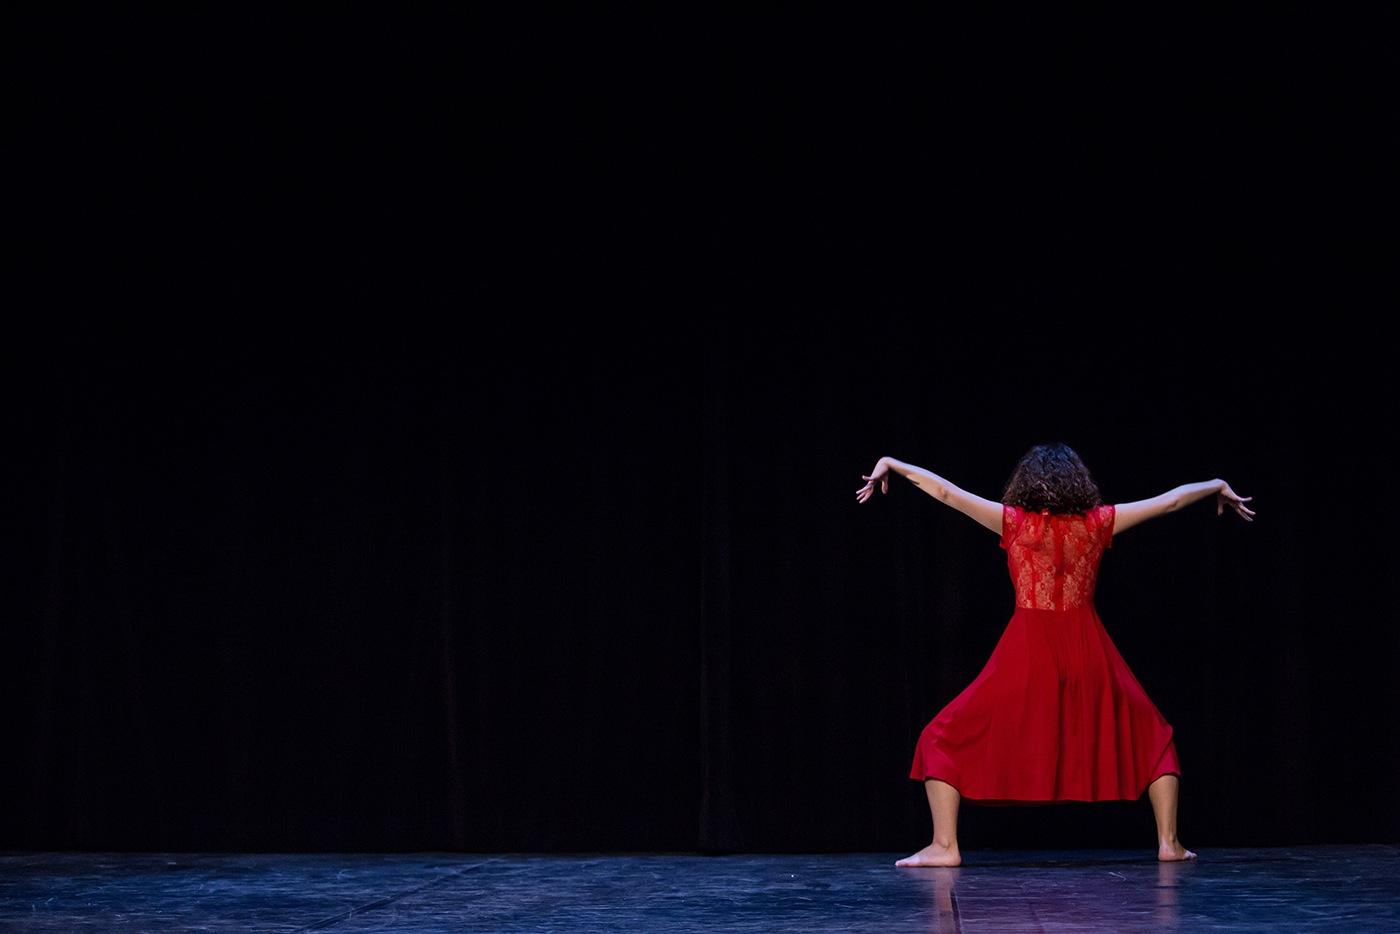 photographe-reportage-danse-avec-ton-crous-guillaume-heraud-018-small